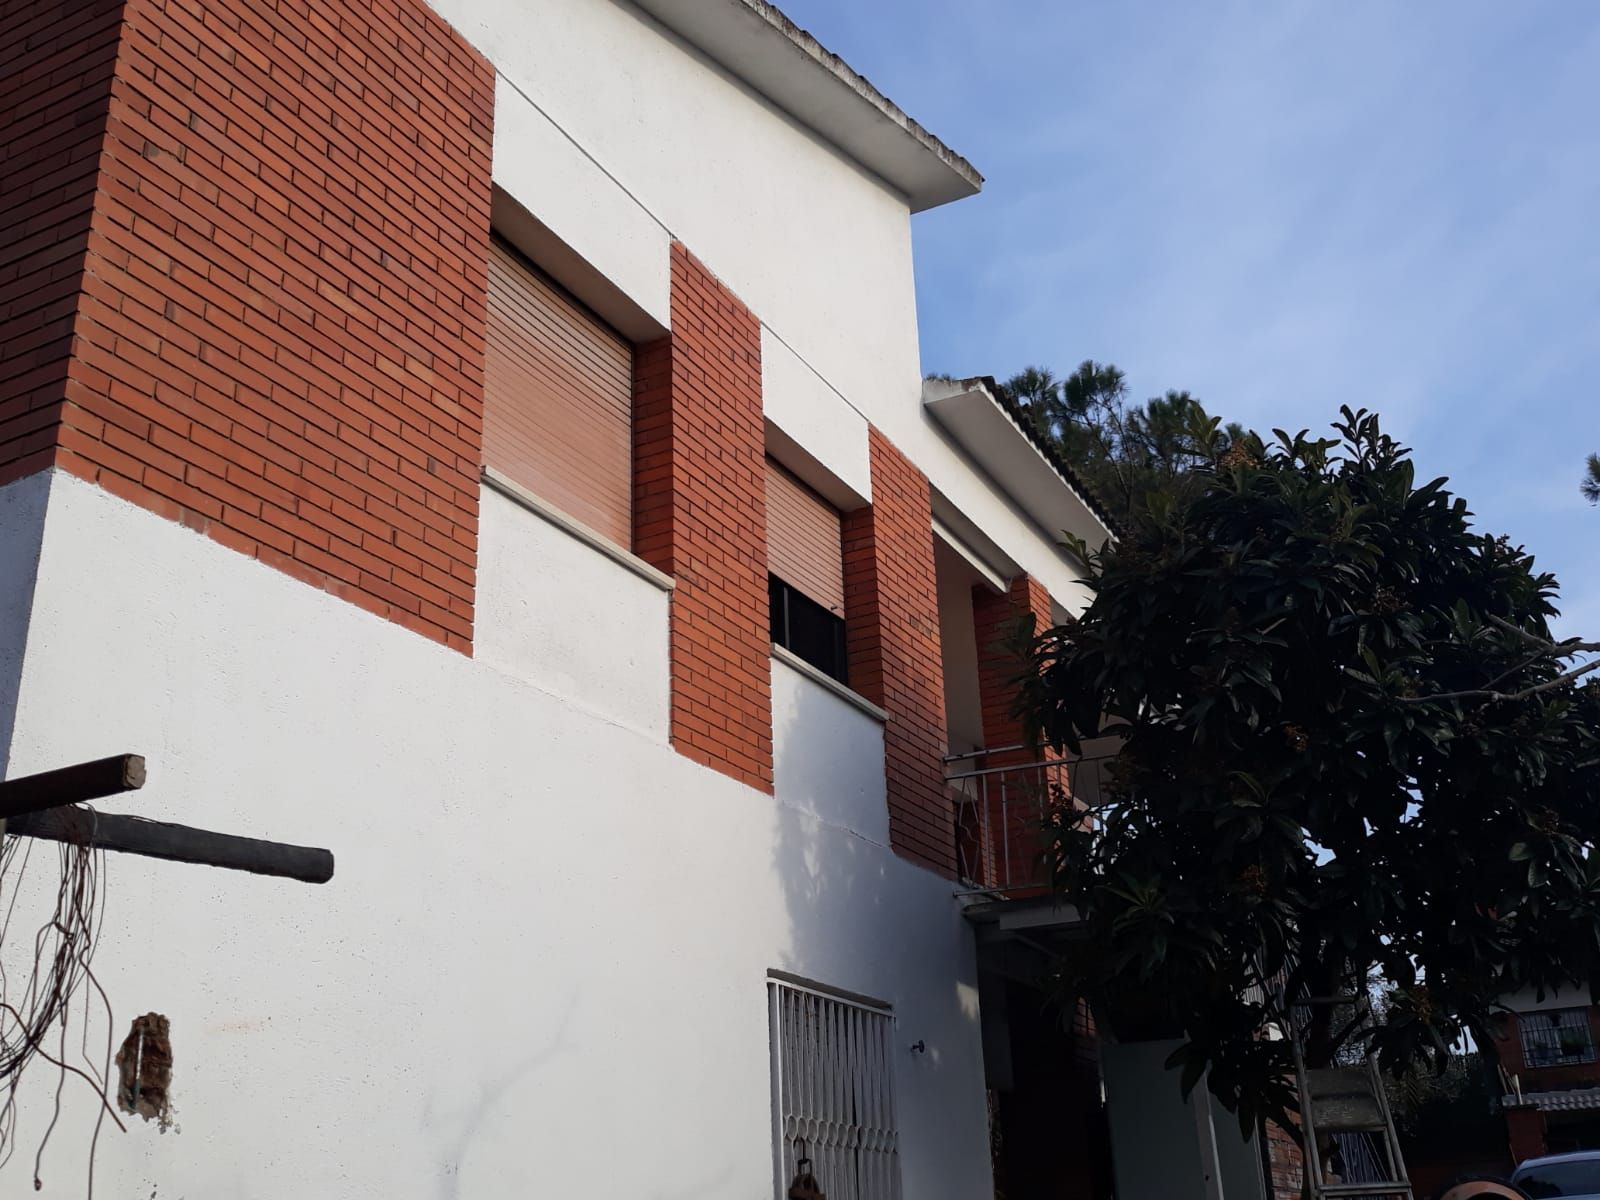 Affitto Casa  Carrer d'amadeu vives, 24